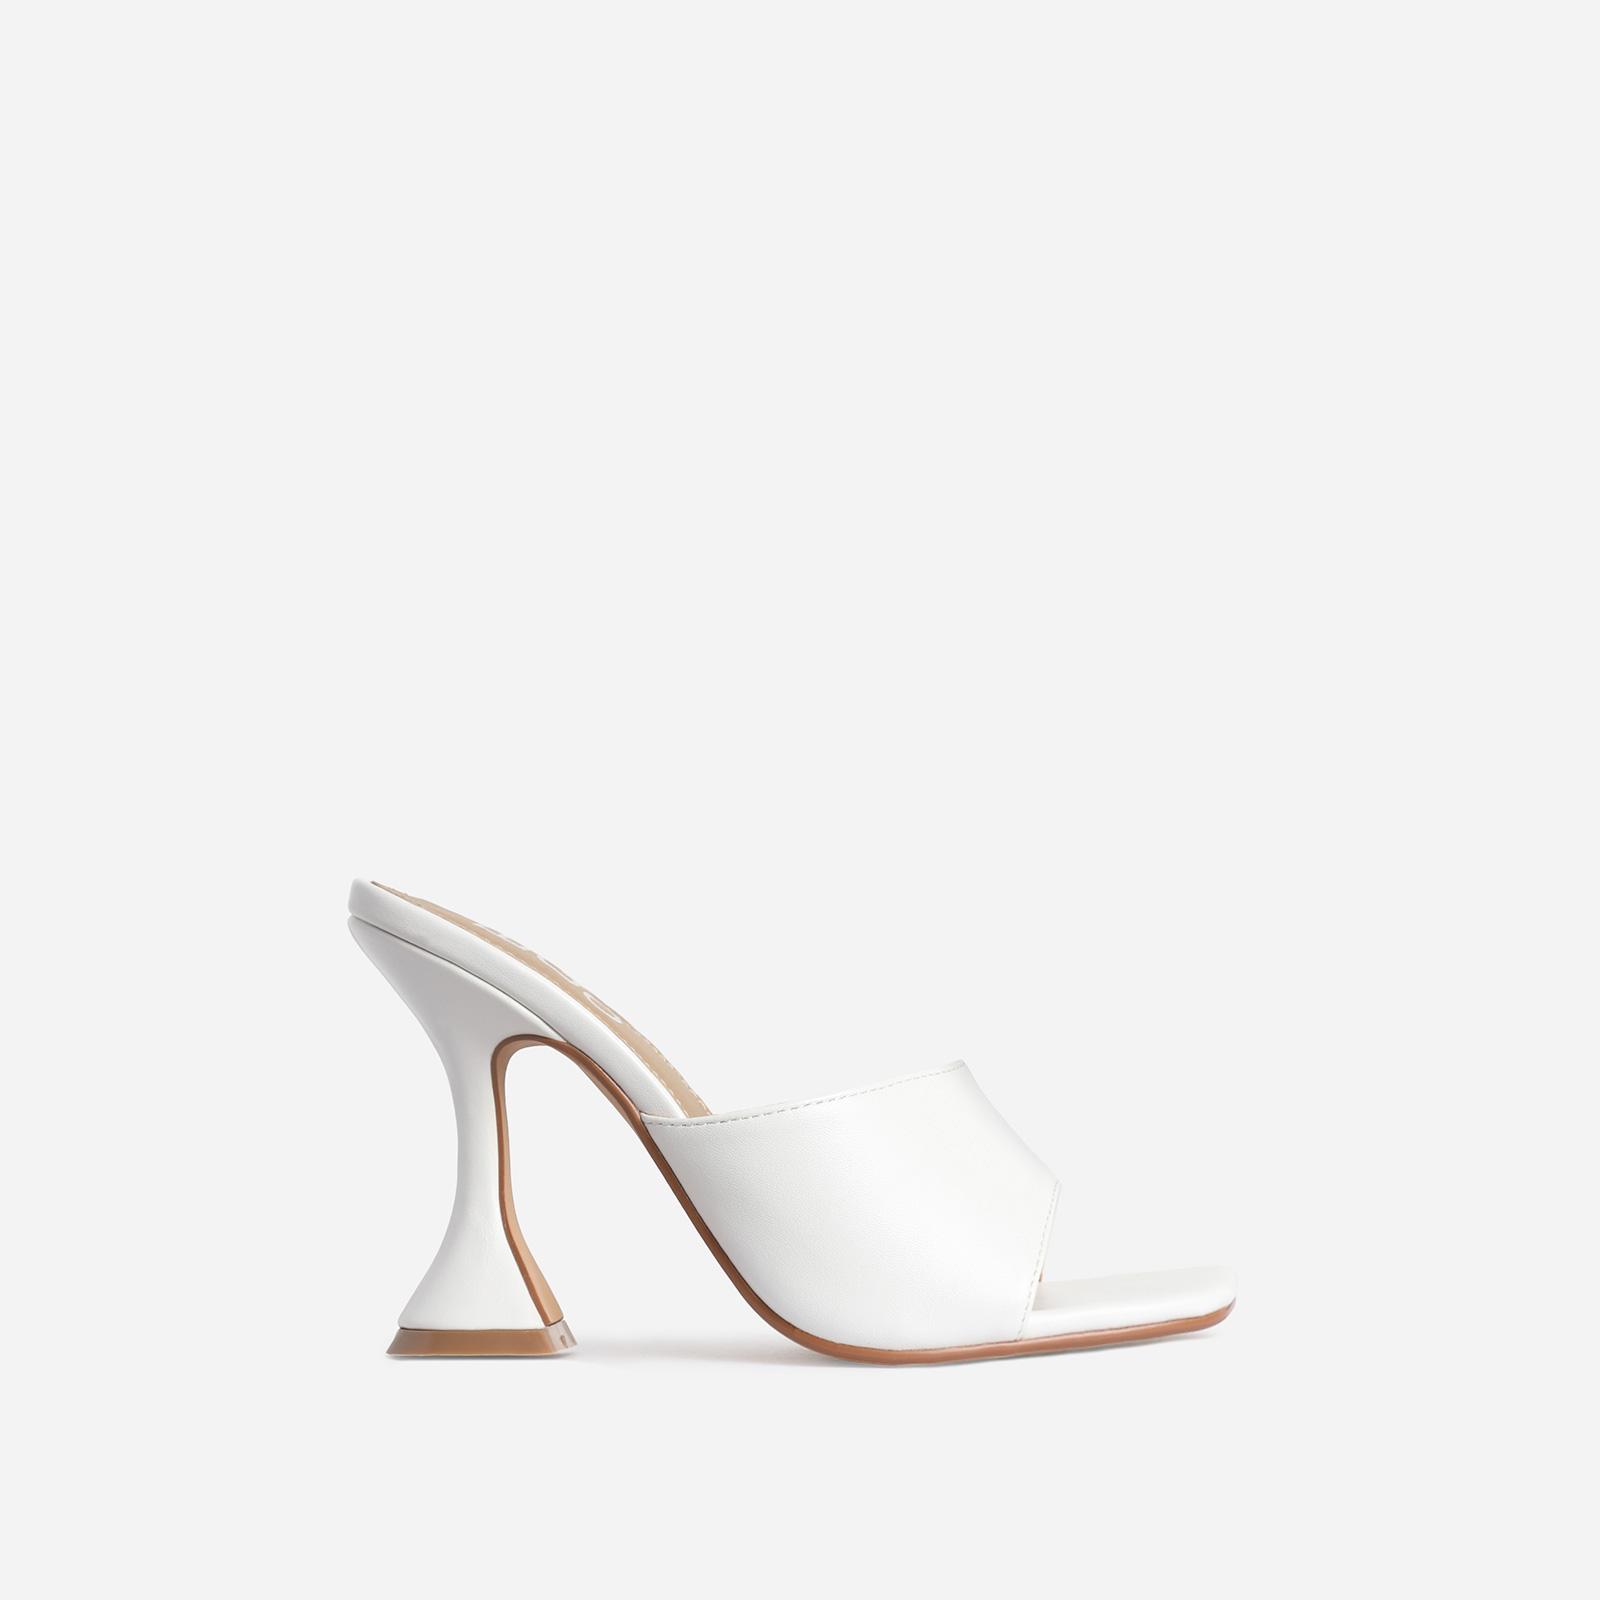 Jordi Peep Square Toe Heel Mule In White Faux Leather